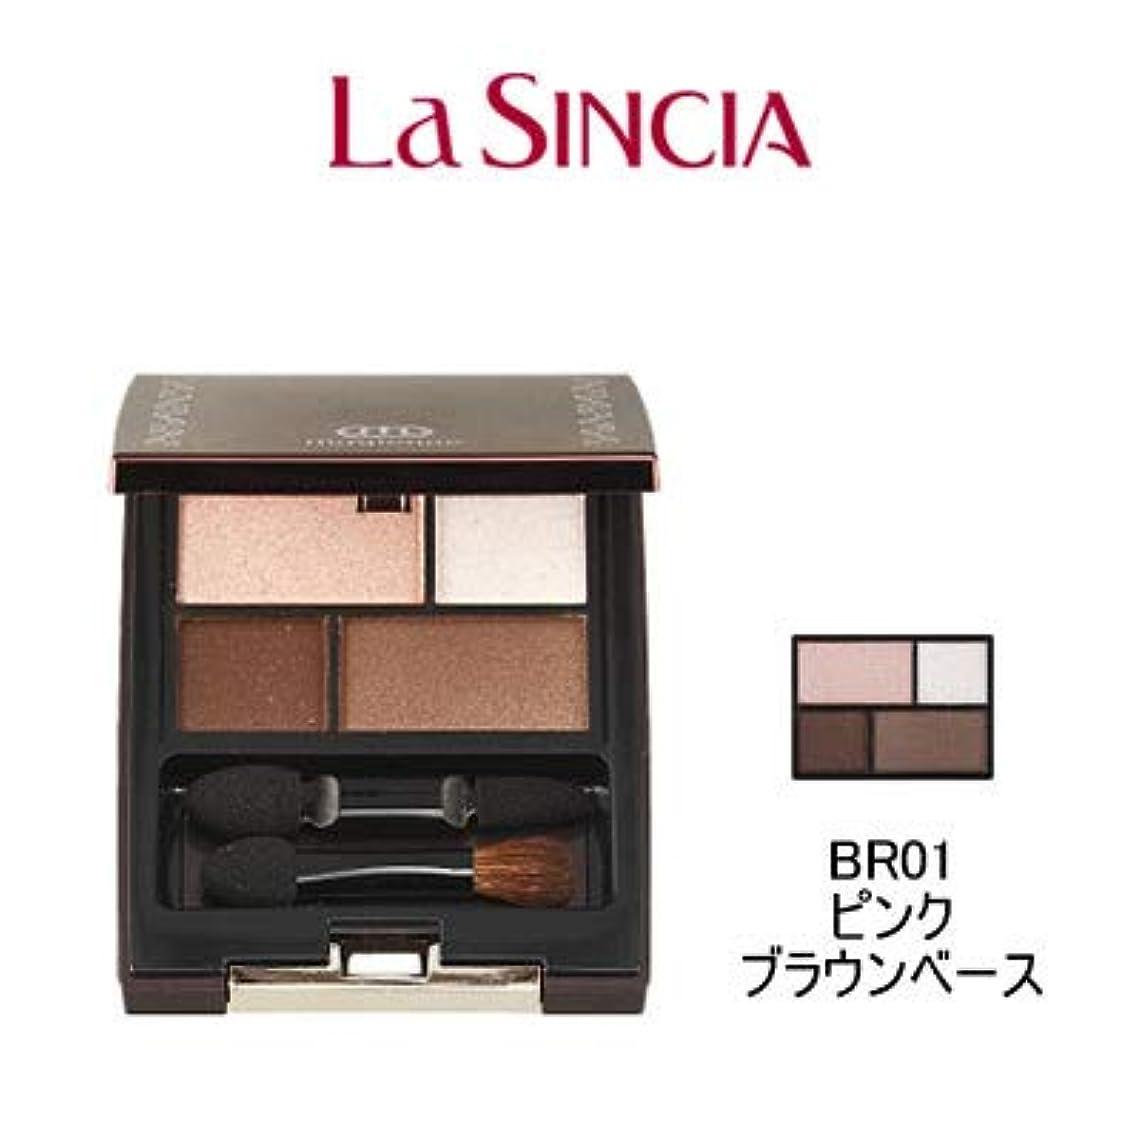 La Sincia ラシンシア マジェンヌ リュクシーカラーアイズ(アイシャドウ)ピンクブラウン